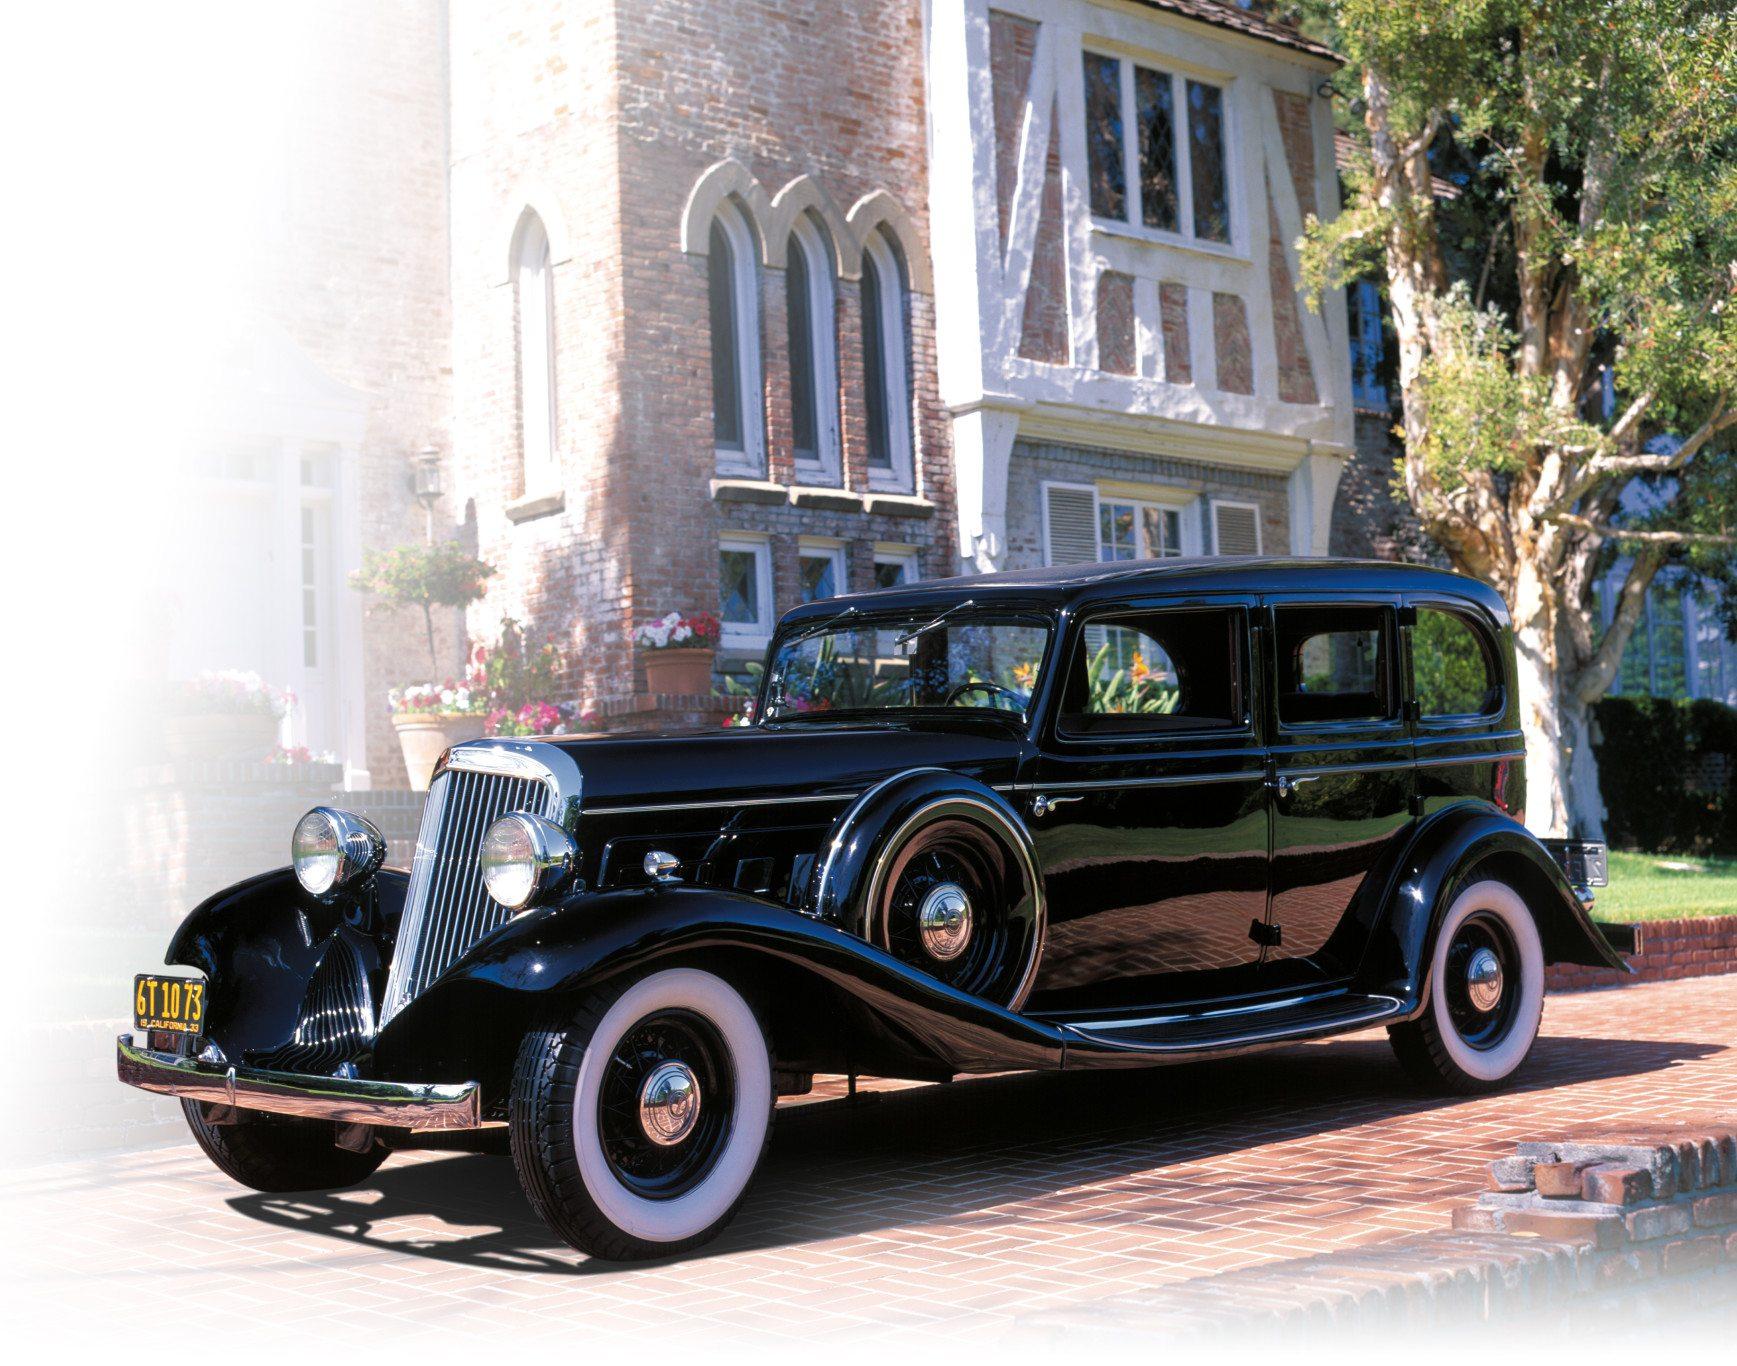 hight resolution of franklin v12 supercharged air cooled v12 automobile engine